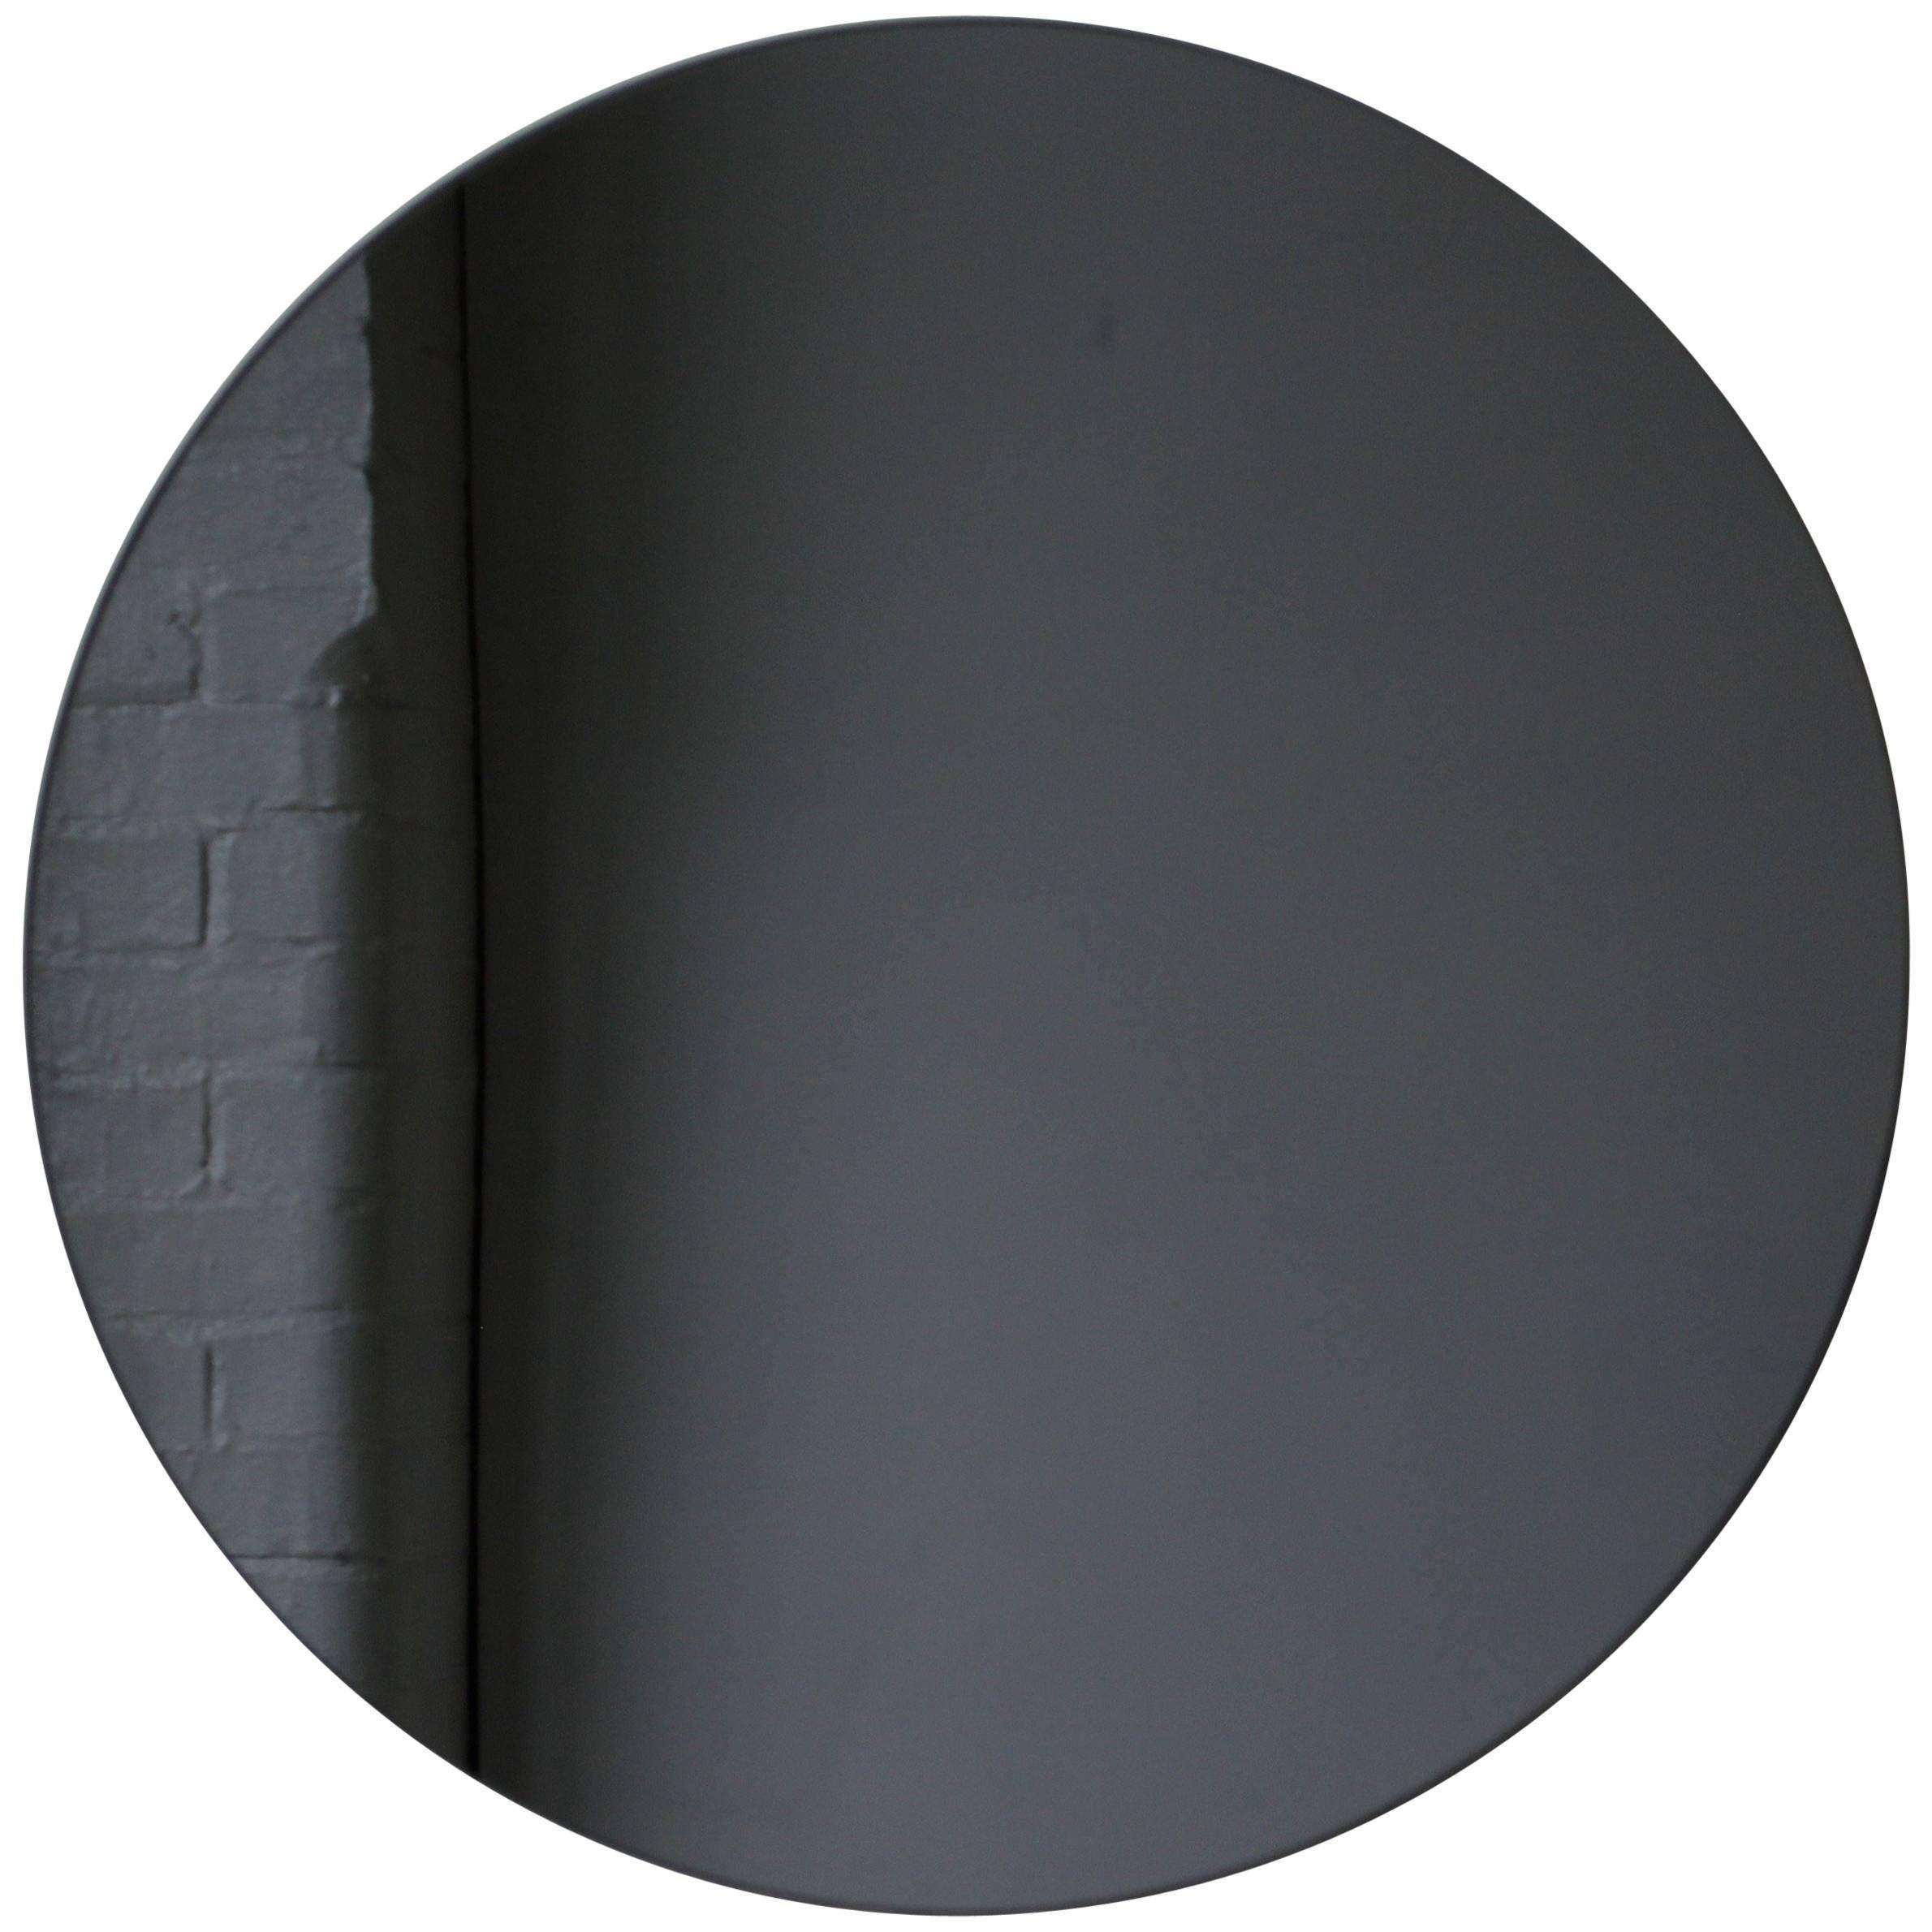 Orbis™ Black Tinted Round Frameless Contemporary Mirror - Large